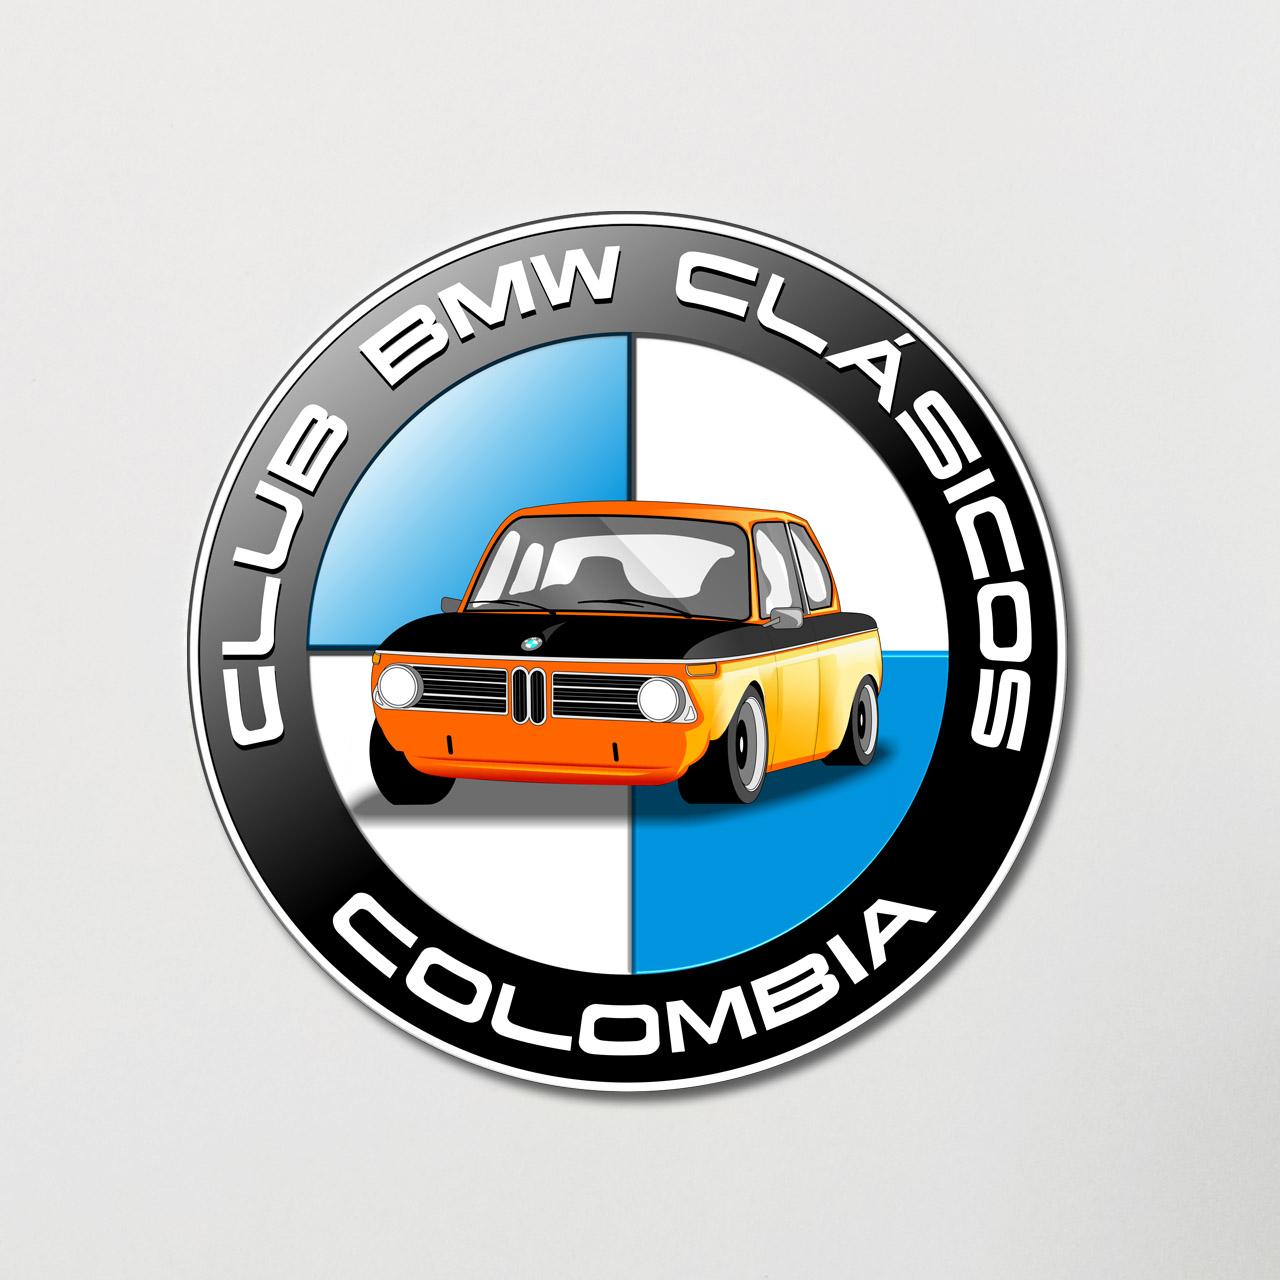 Calcomania BMW Club Vintage